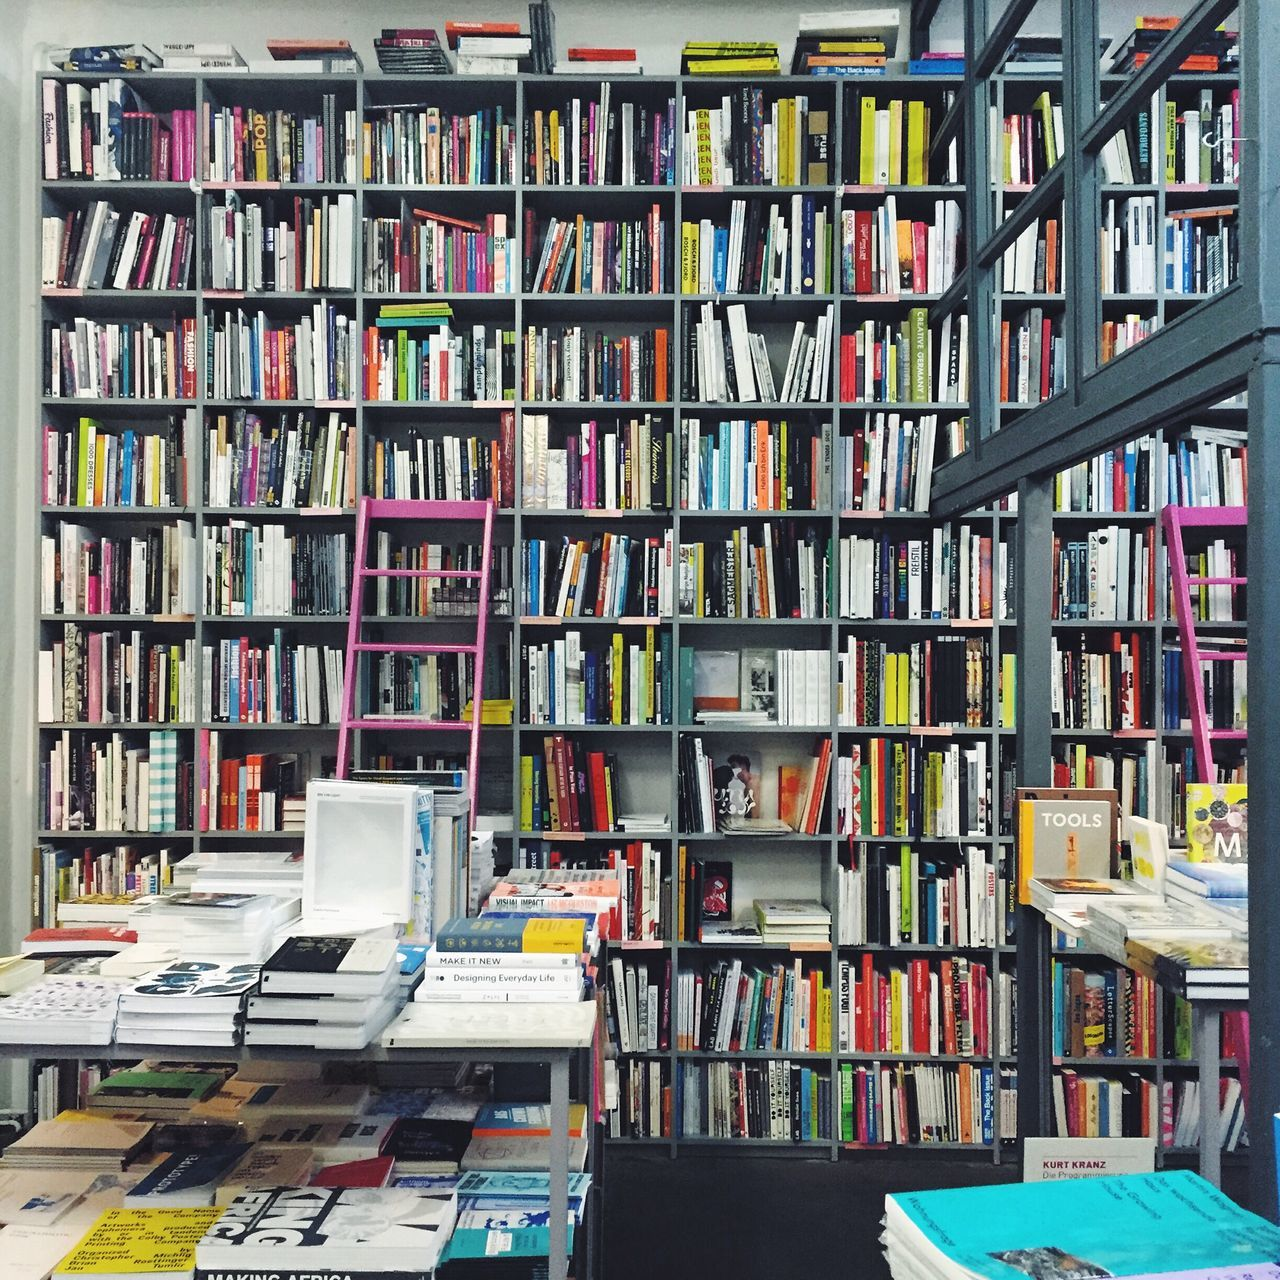 Books Book Store Shelf Book Collections Book Shelves Book Shop Library Mini Library Interior Design Interior